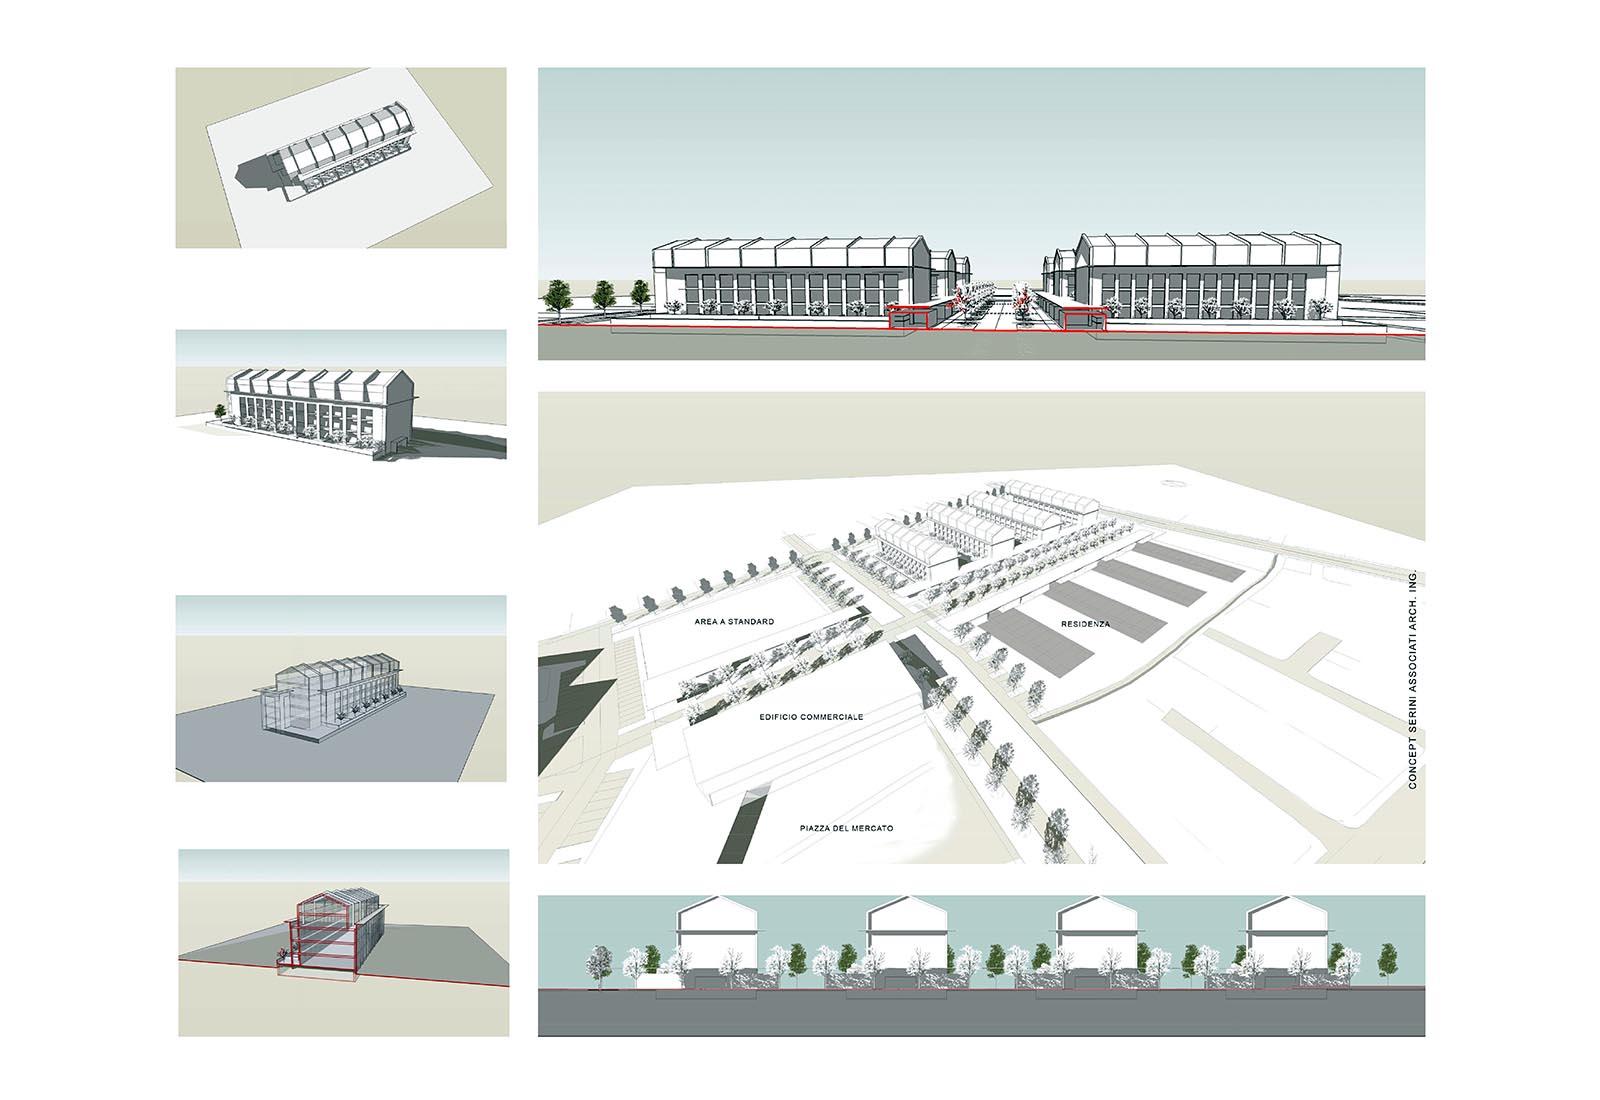 PII Fizzonasco - Modello volumetrico edificio tipo